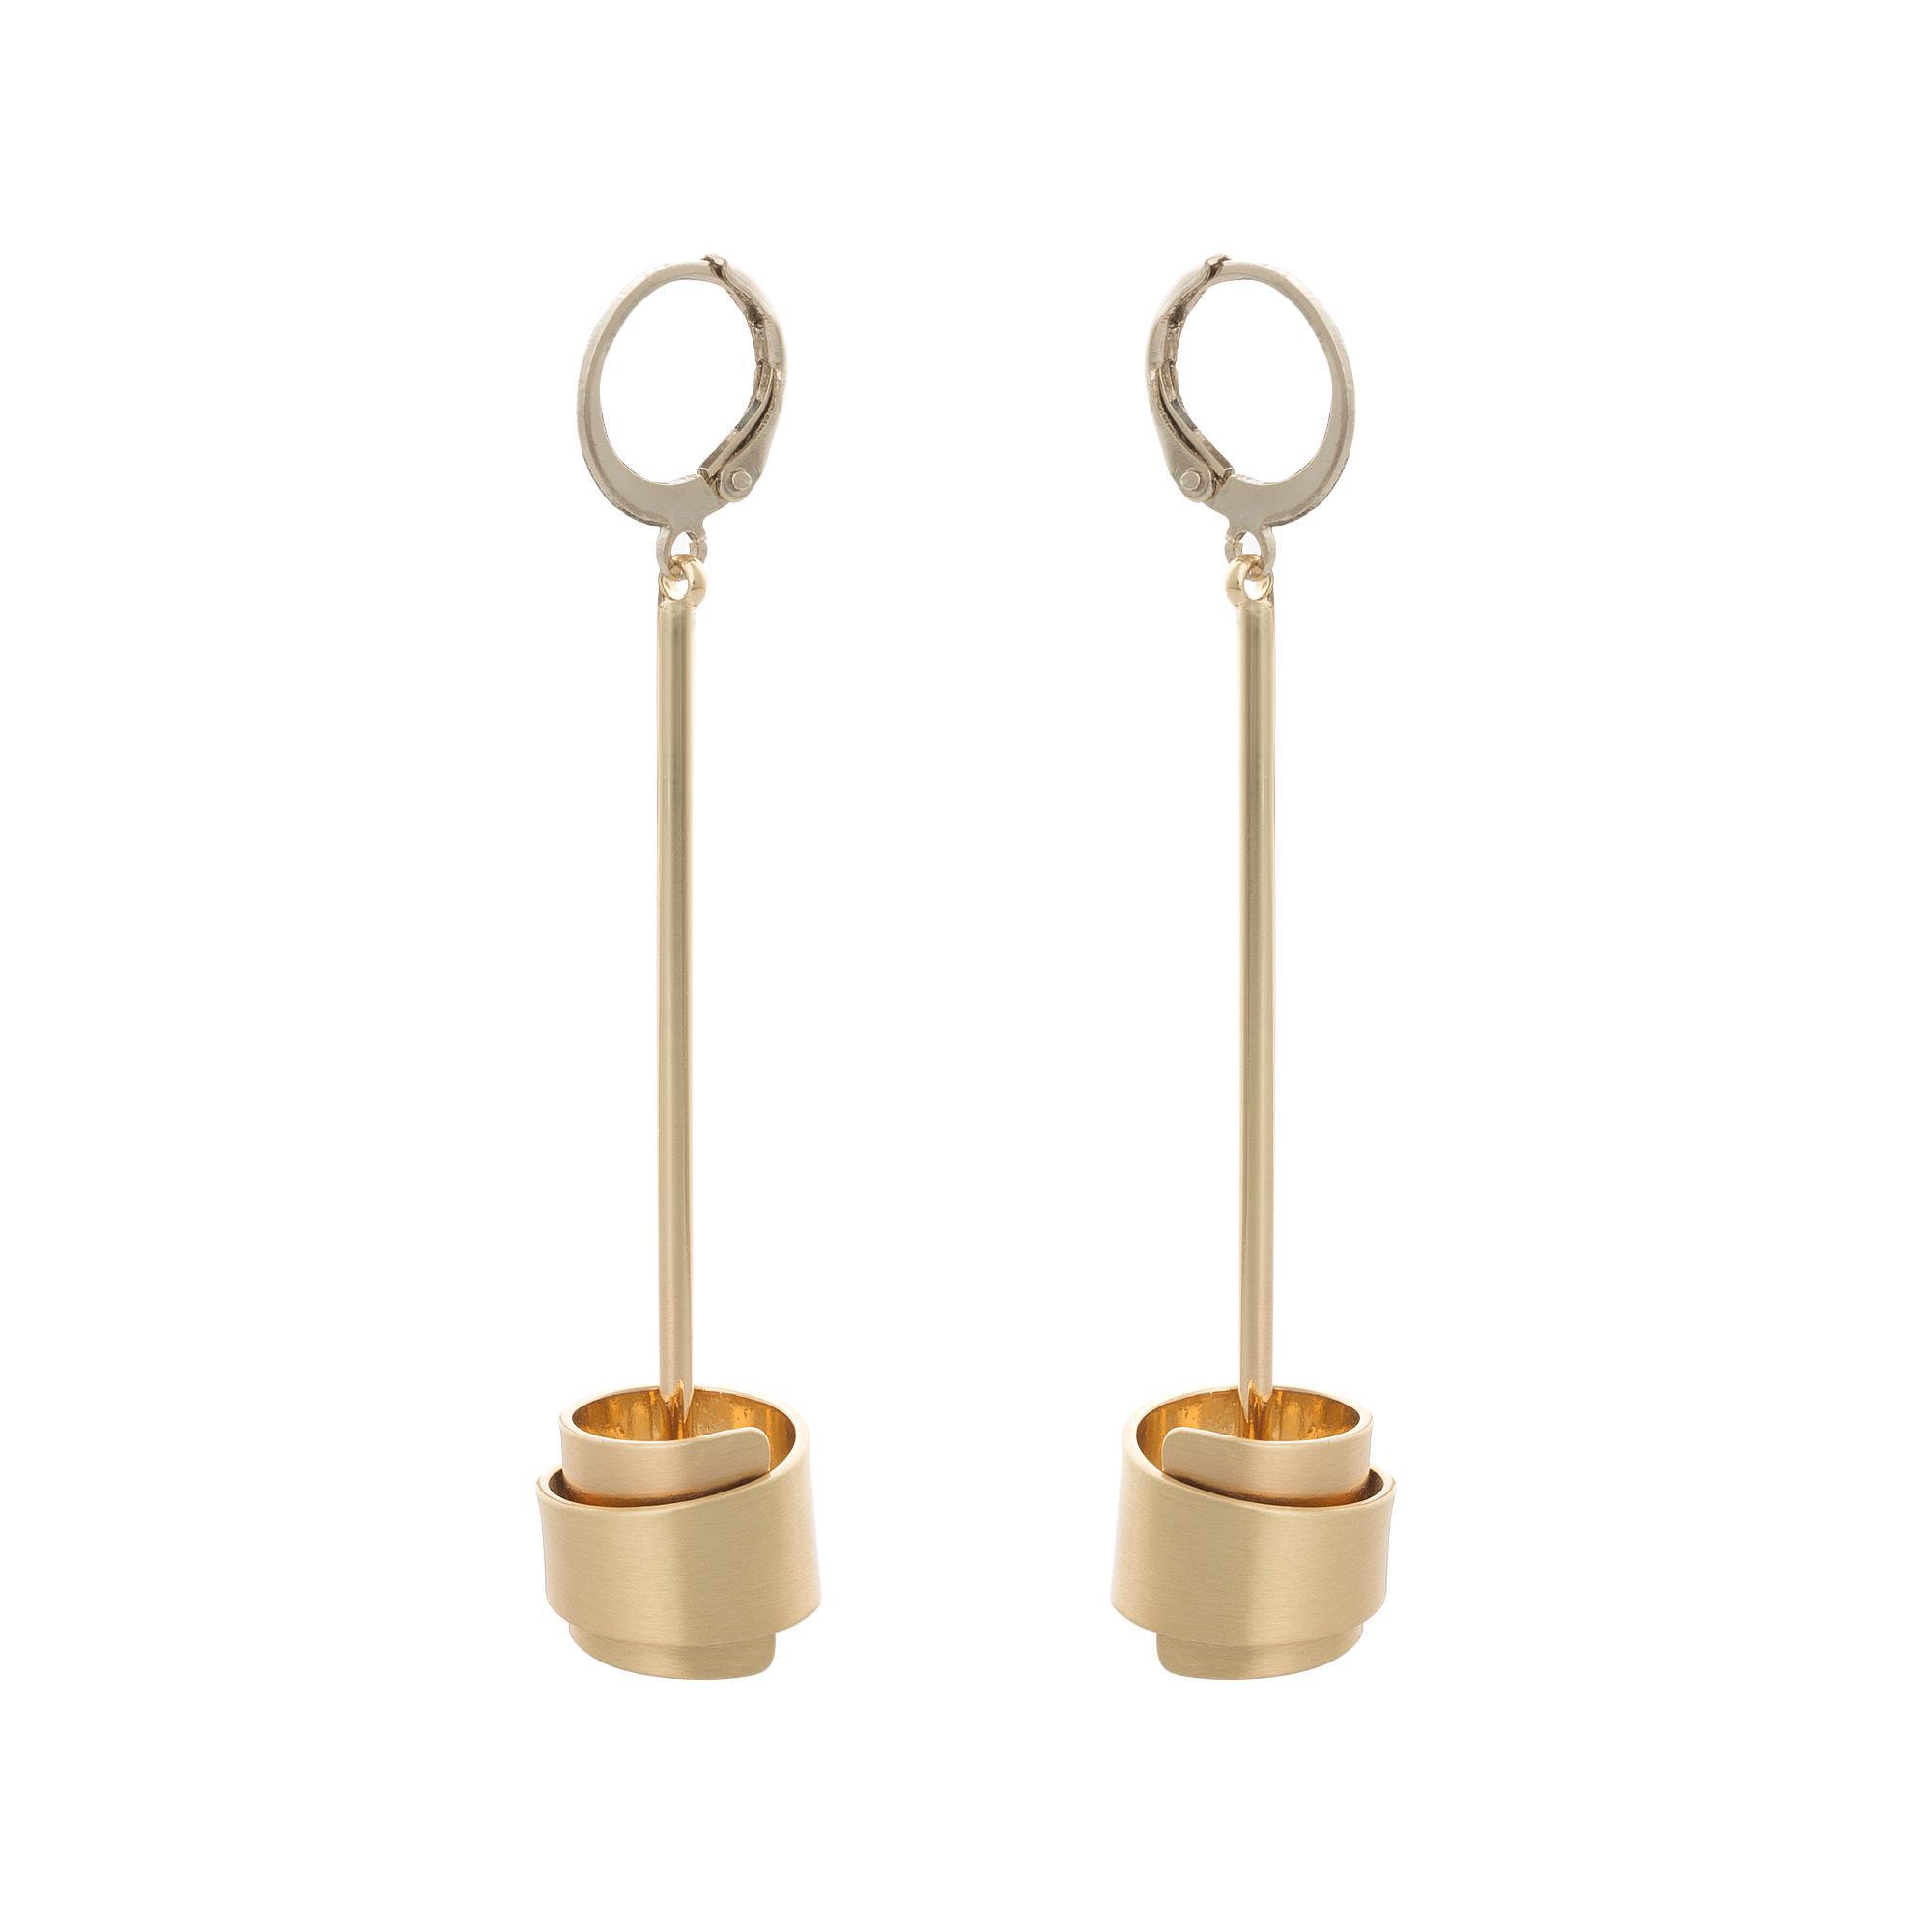 Lyst - Oliver Bonas Nassau Bar & Curved Tube Drop Earrings in Metallic